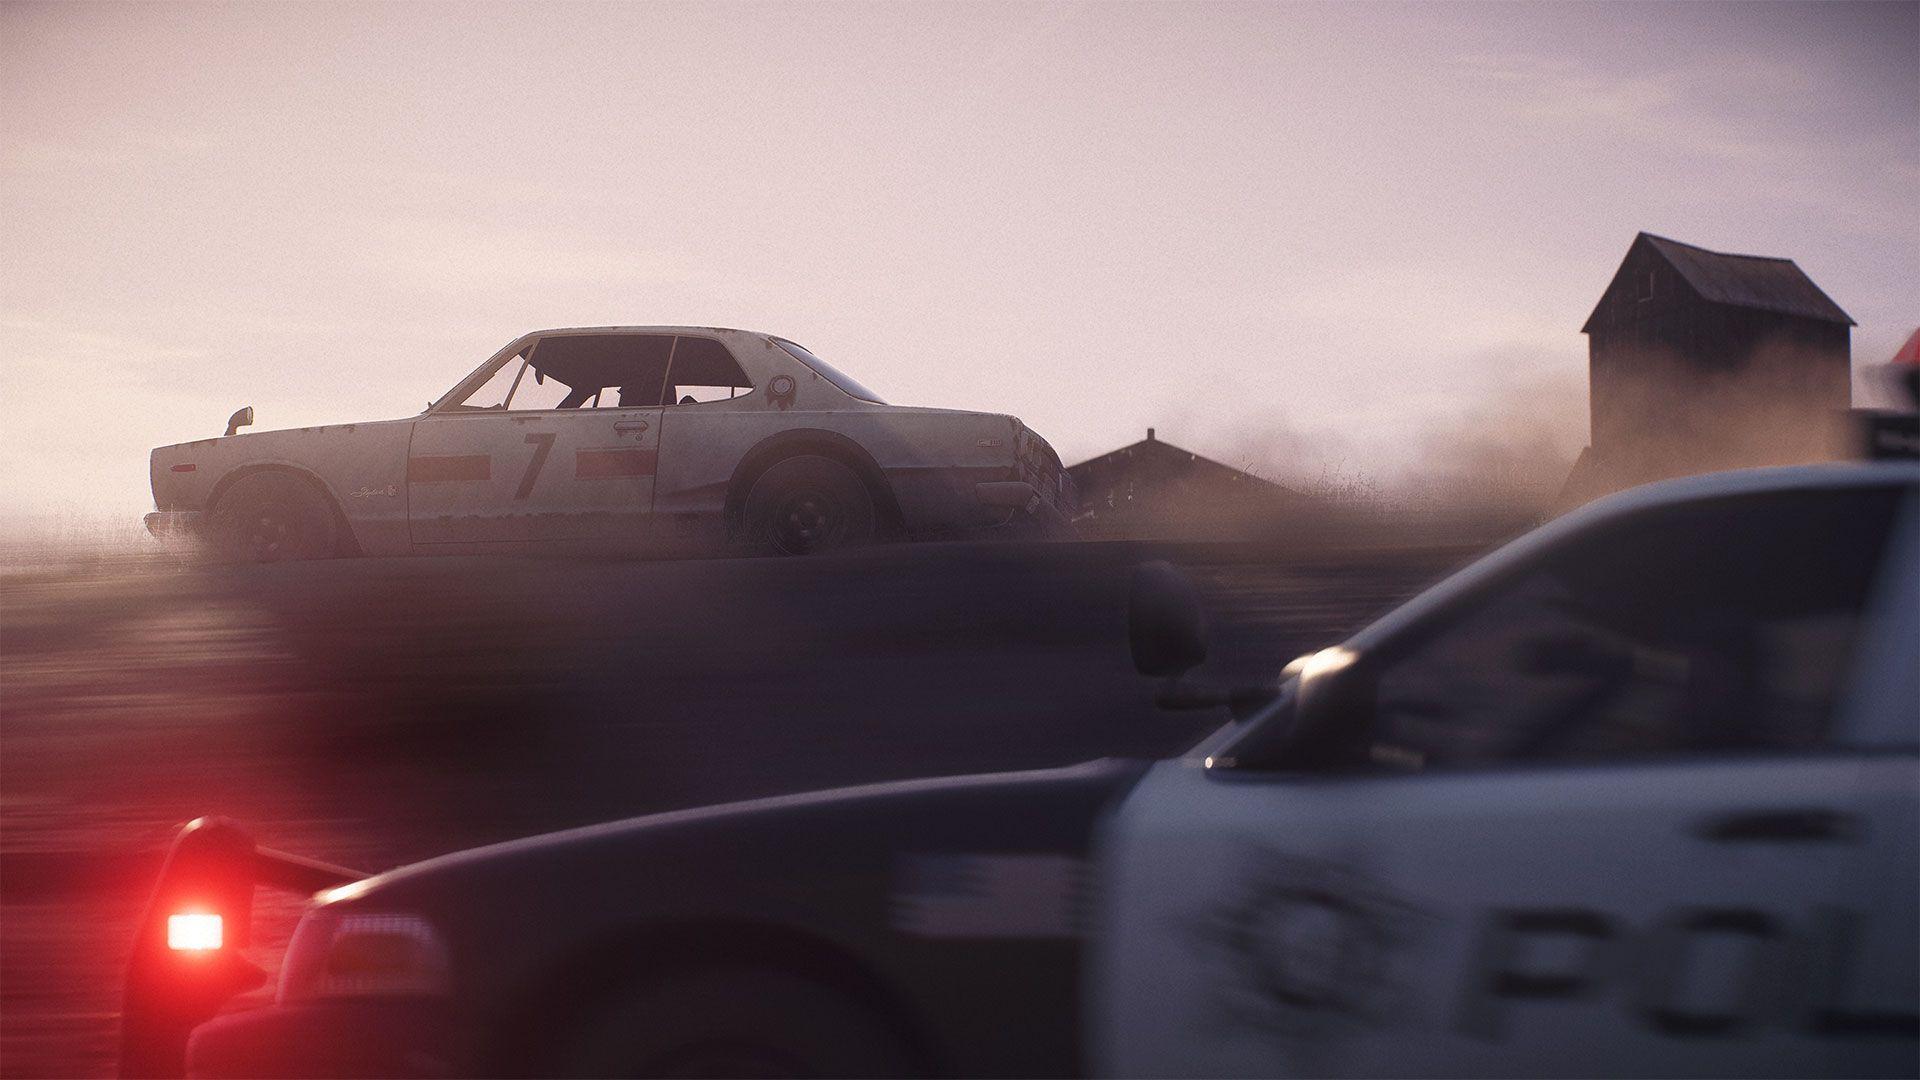 Need for Speed Payback İndir – Full | Oyun İndir Club - Full PC ve Android Oyunları